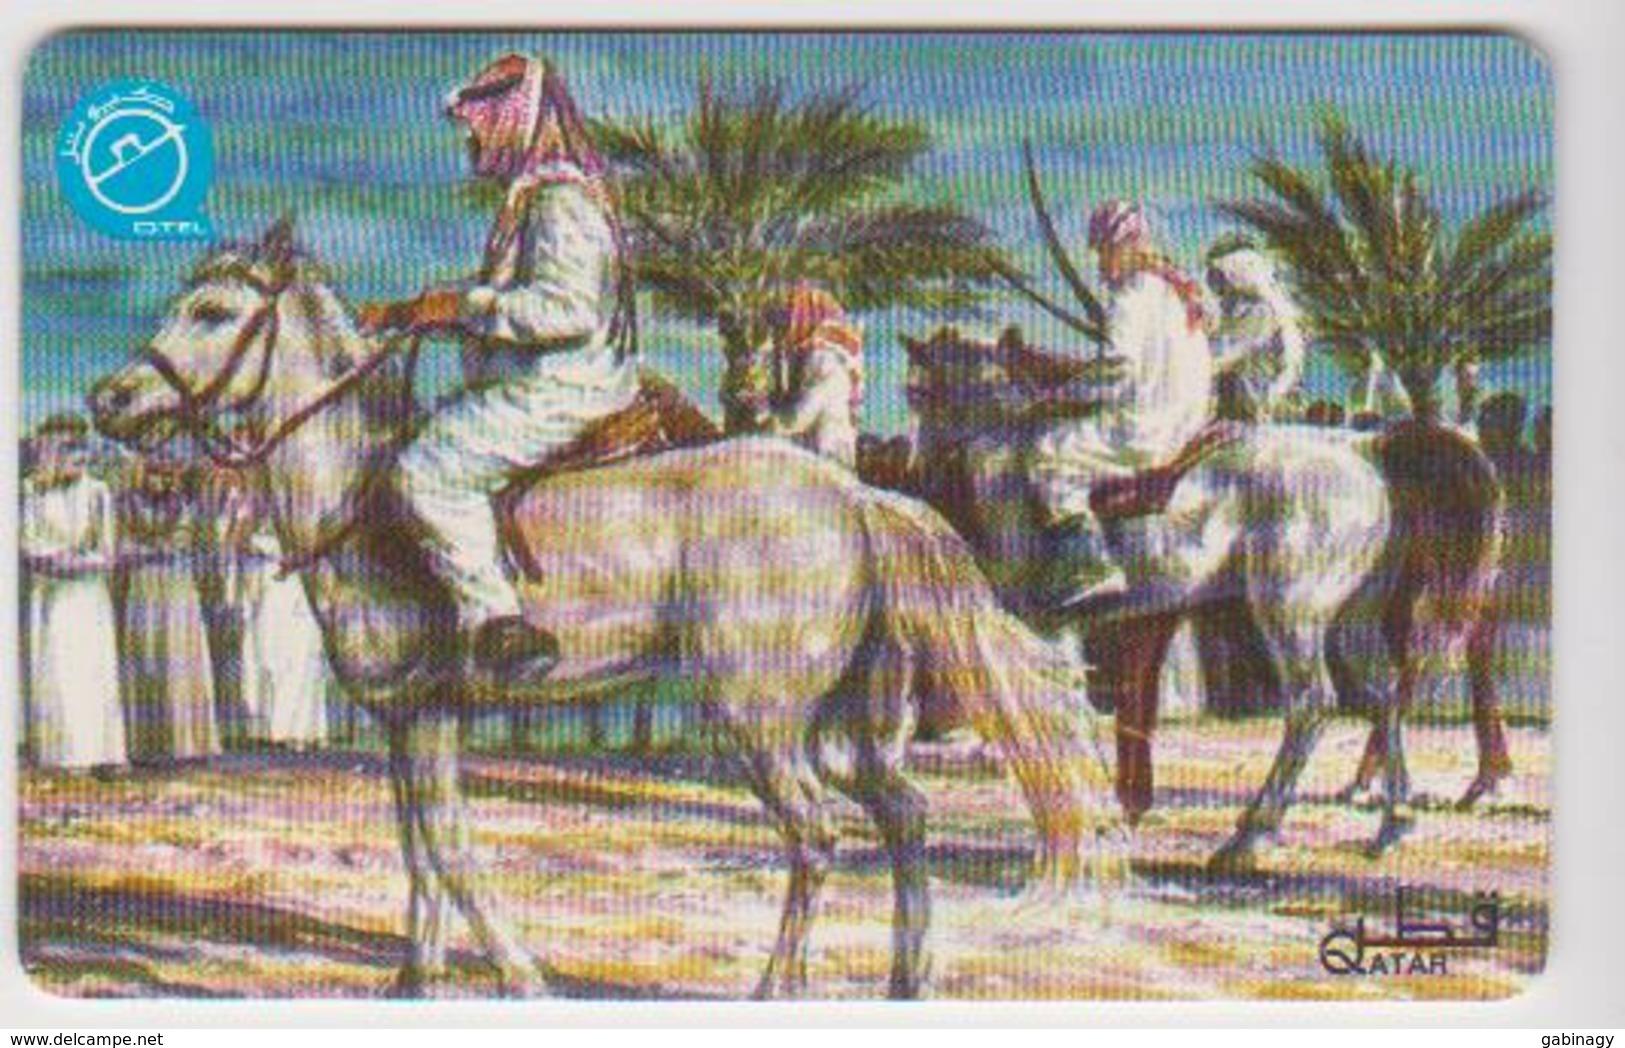 #05 - QATAR-01 - HORSE - Qatar